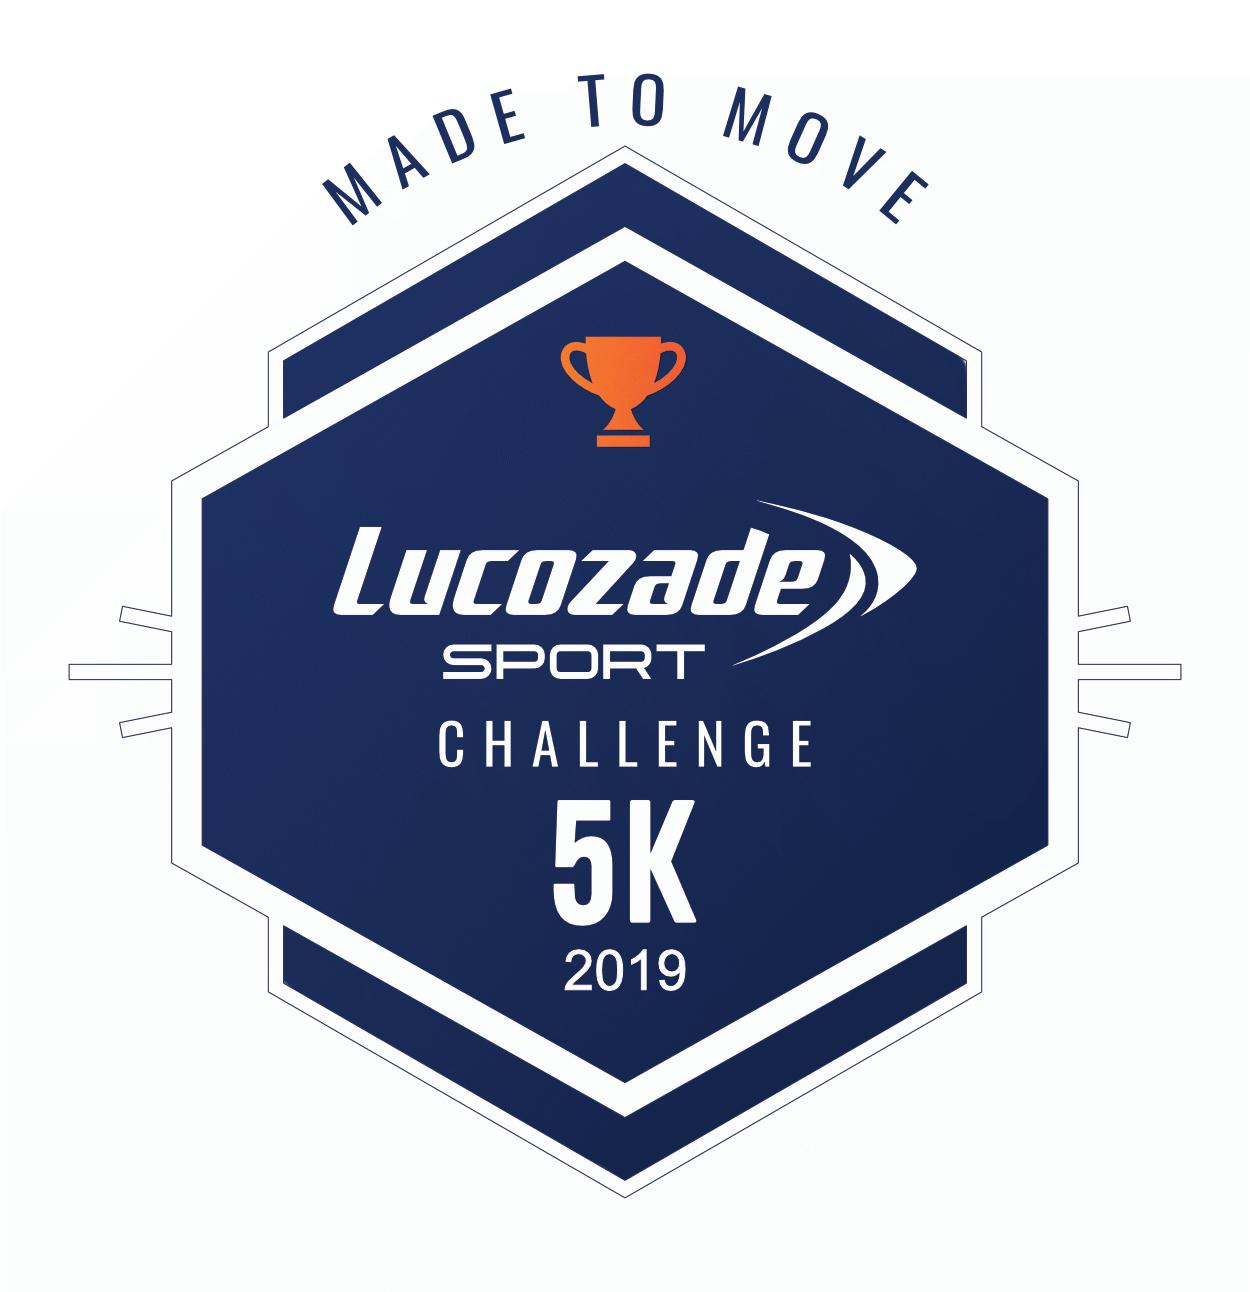 Lucozade Sport #MadetoMove Challenge